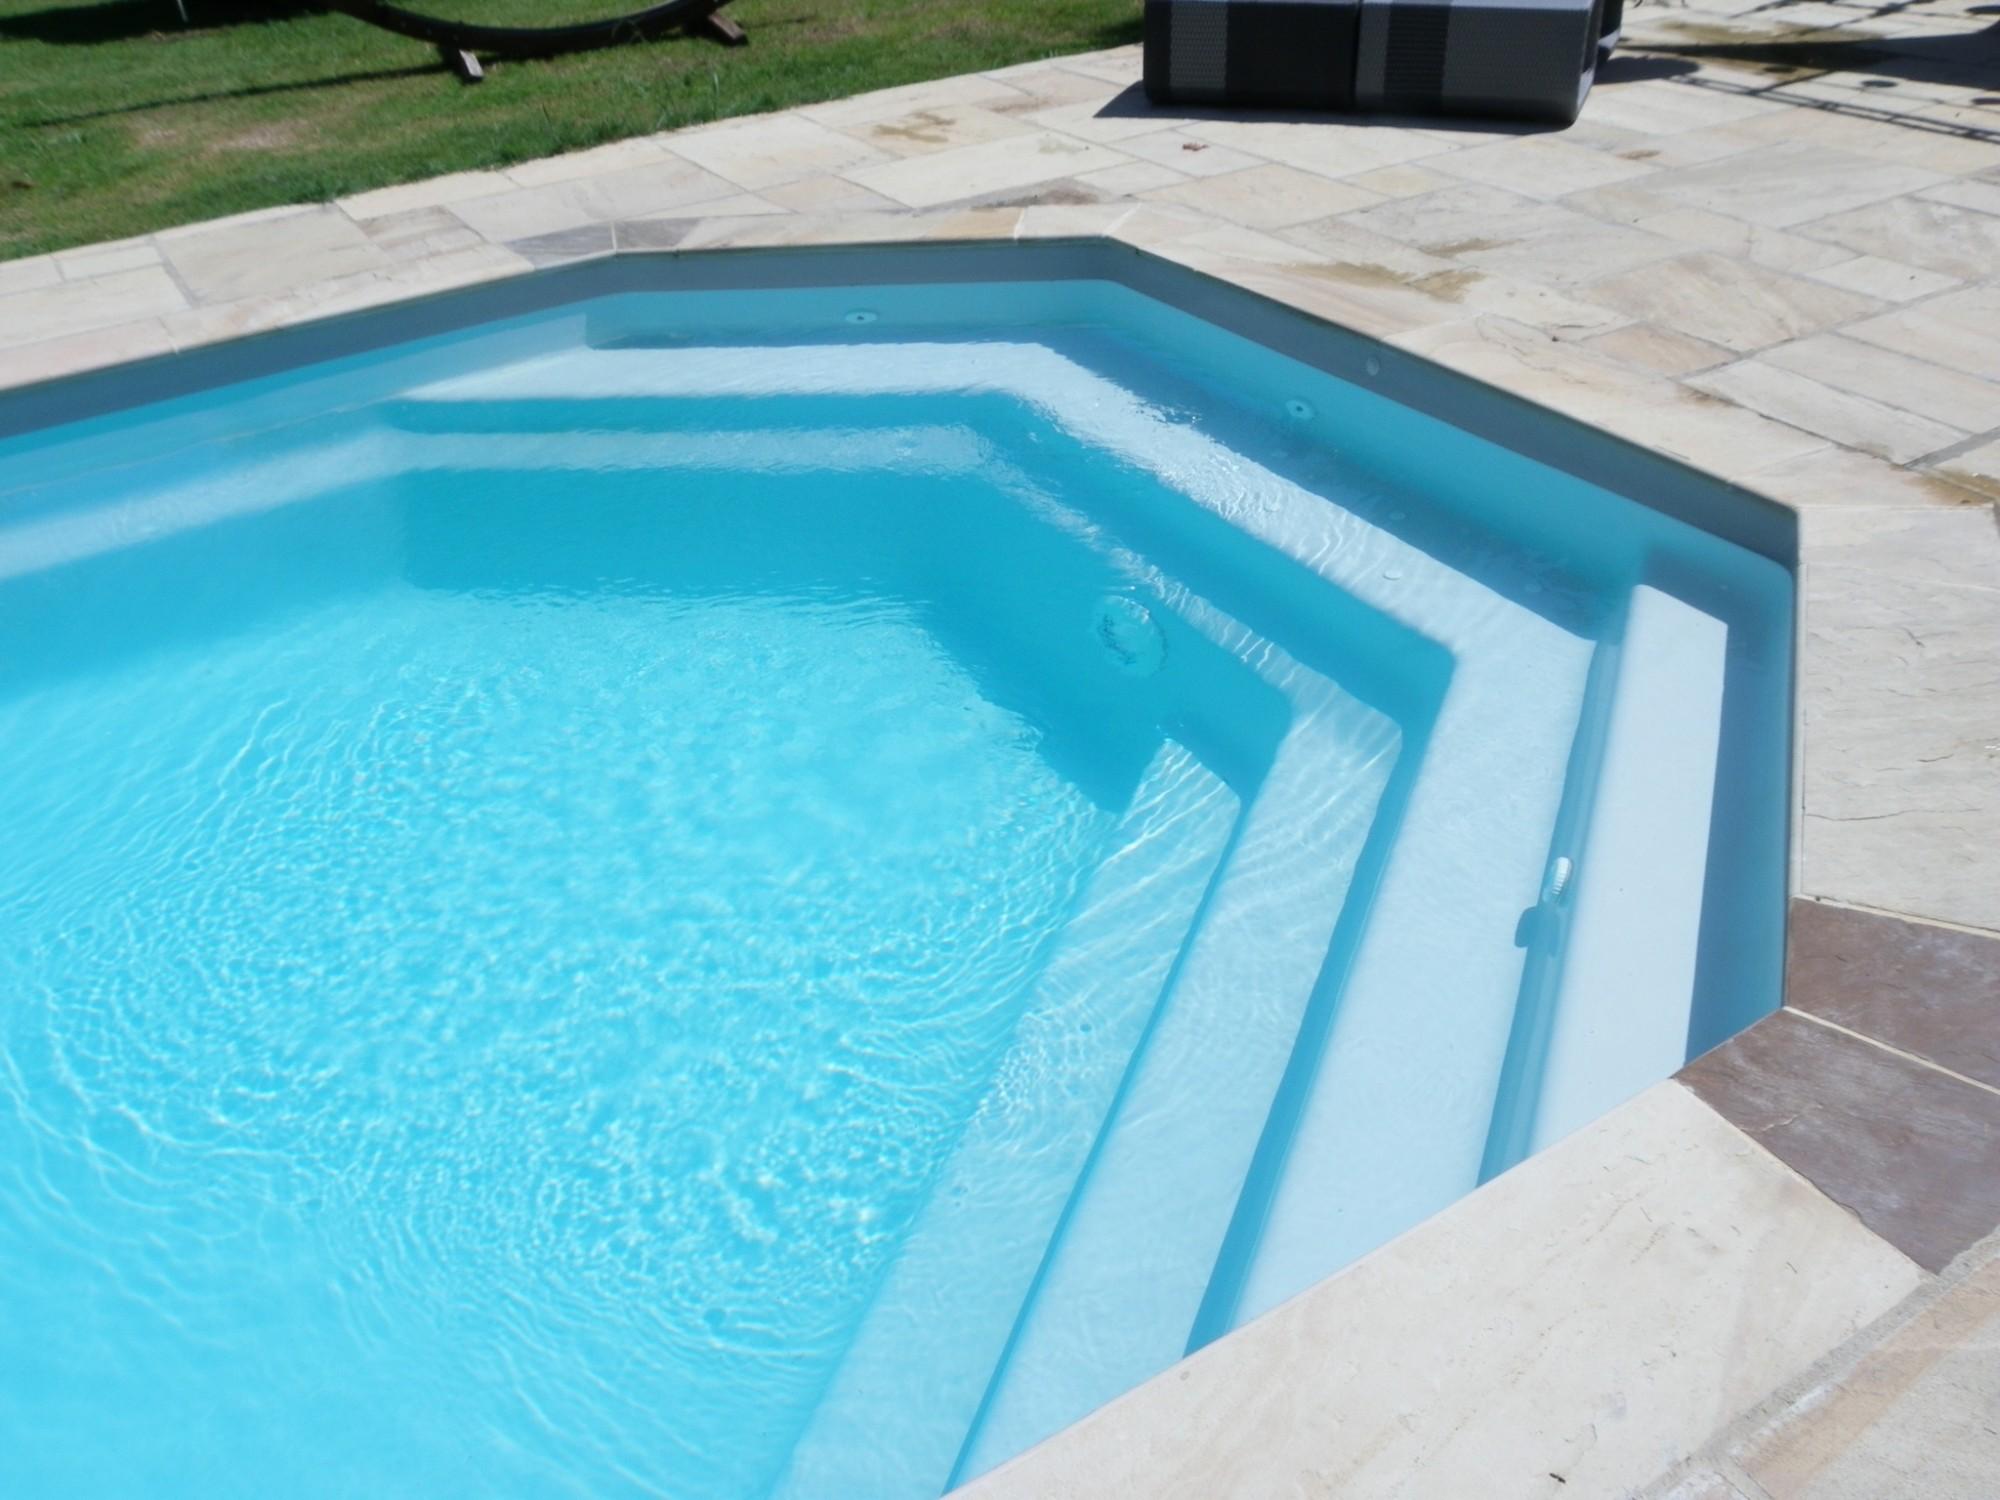 Монтаж лестницы для бассейна